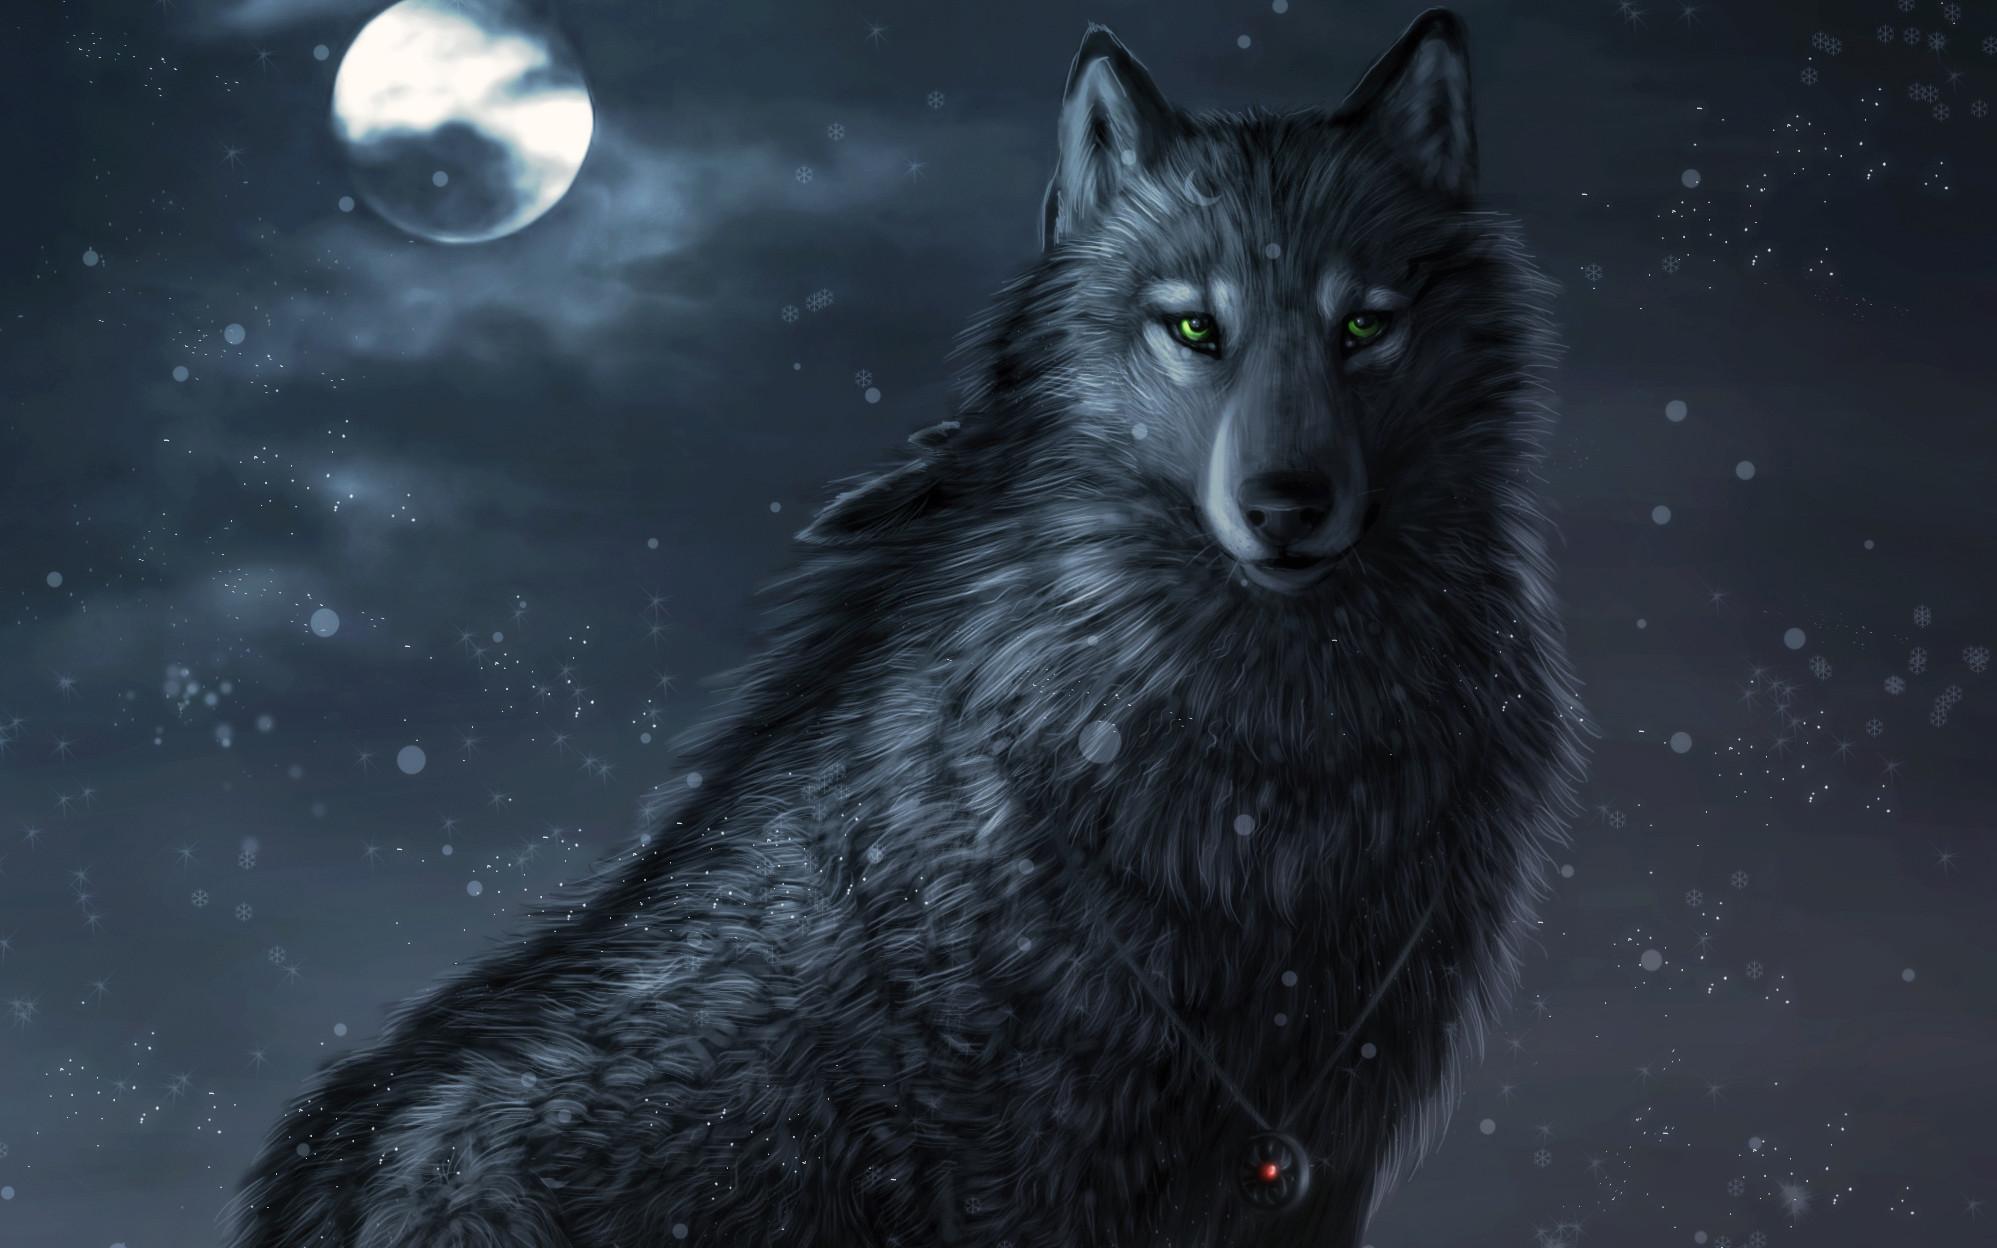 Wallpapers, Desktop Backgrounds | | ID:229738 Cool Fire Wolf .